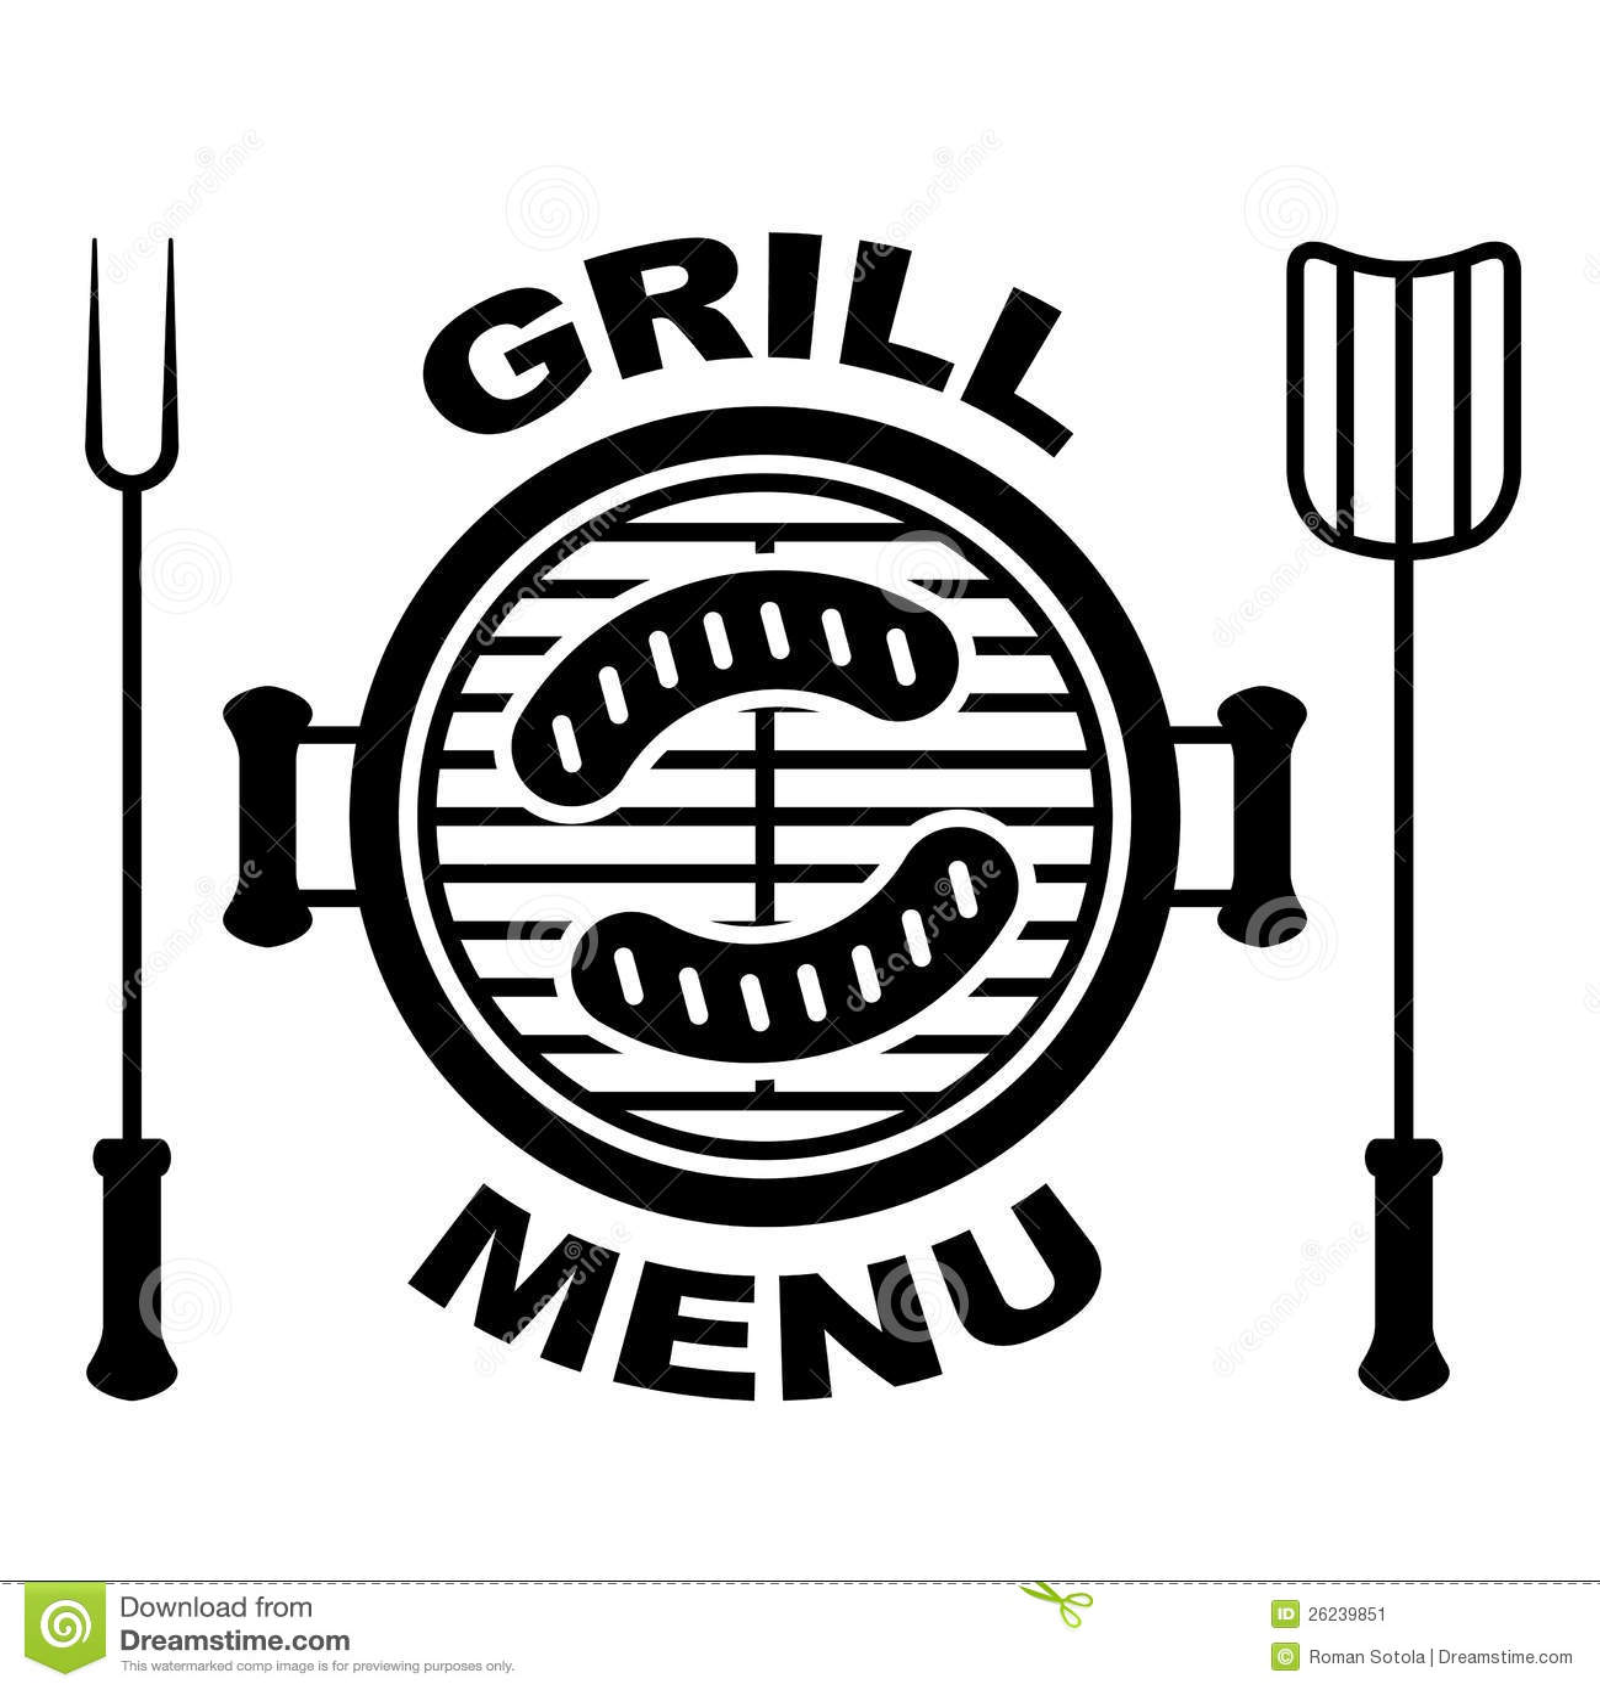 Grill Menu Symbol Stock Image